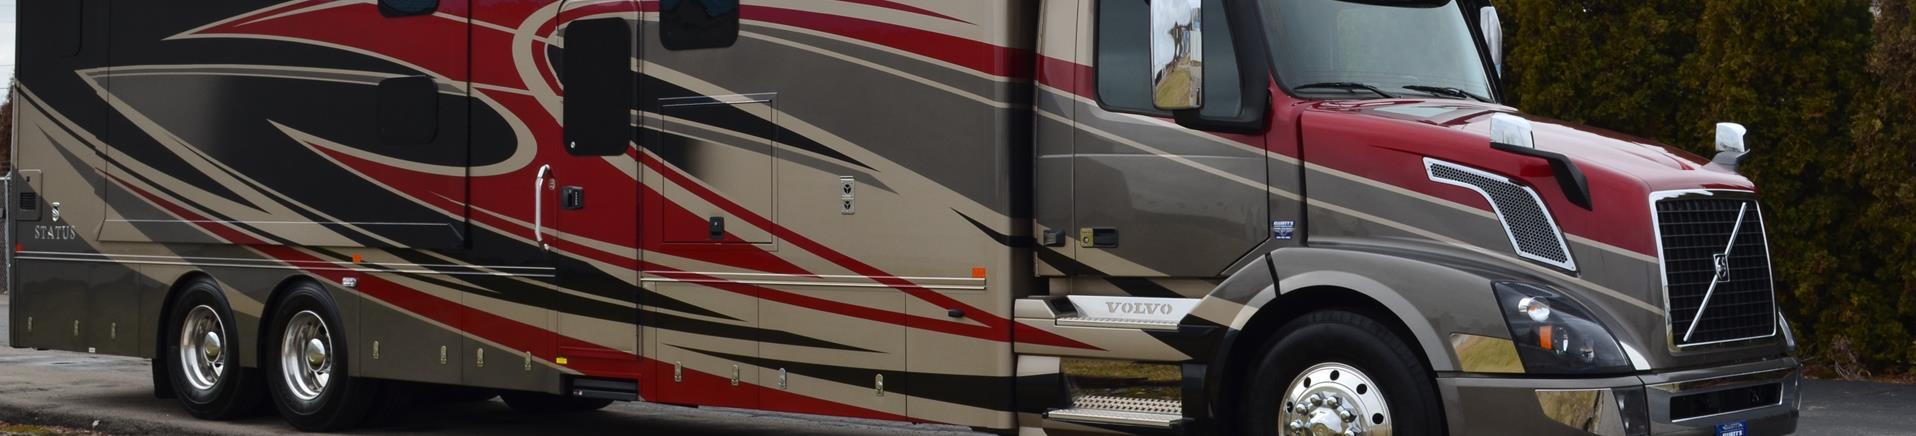 Elliott's Custom Trailers and Carts